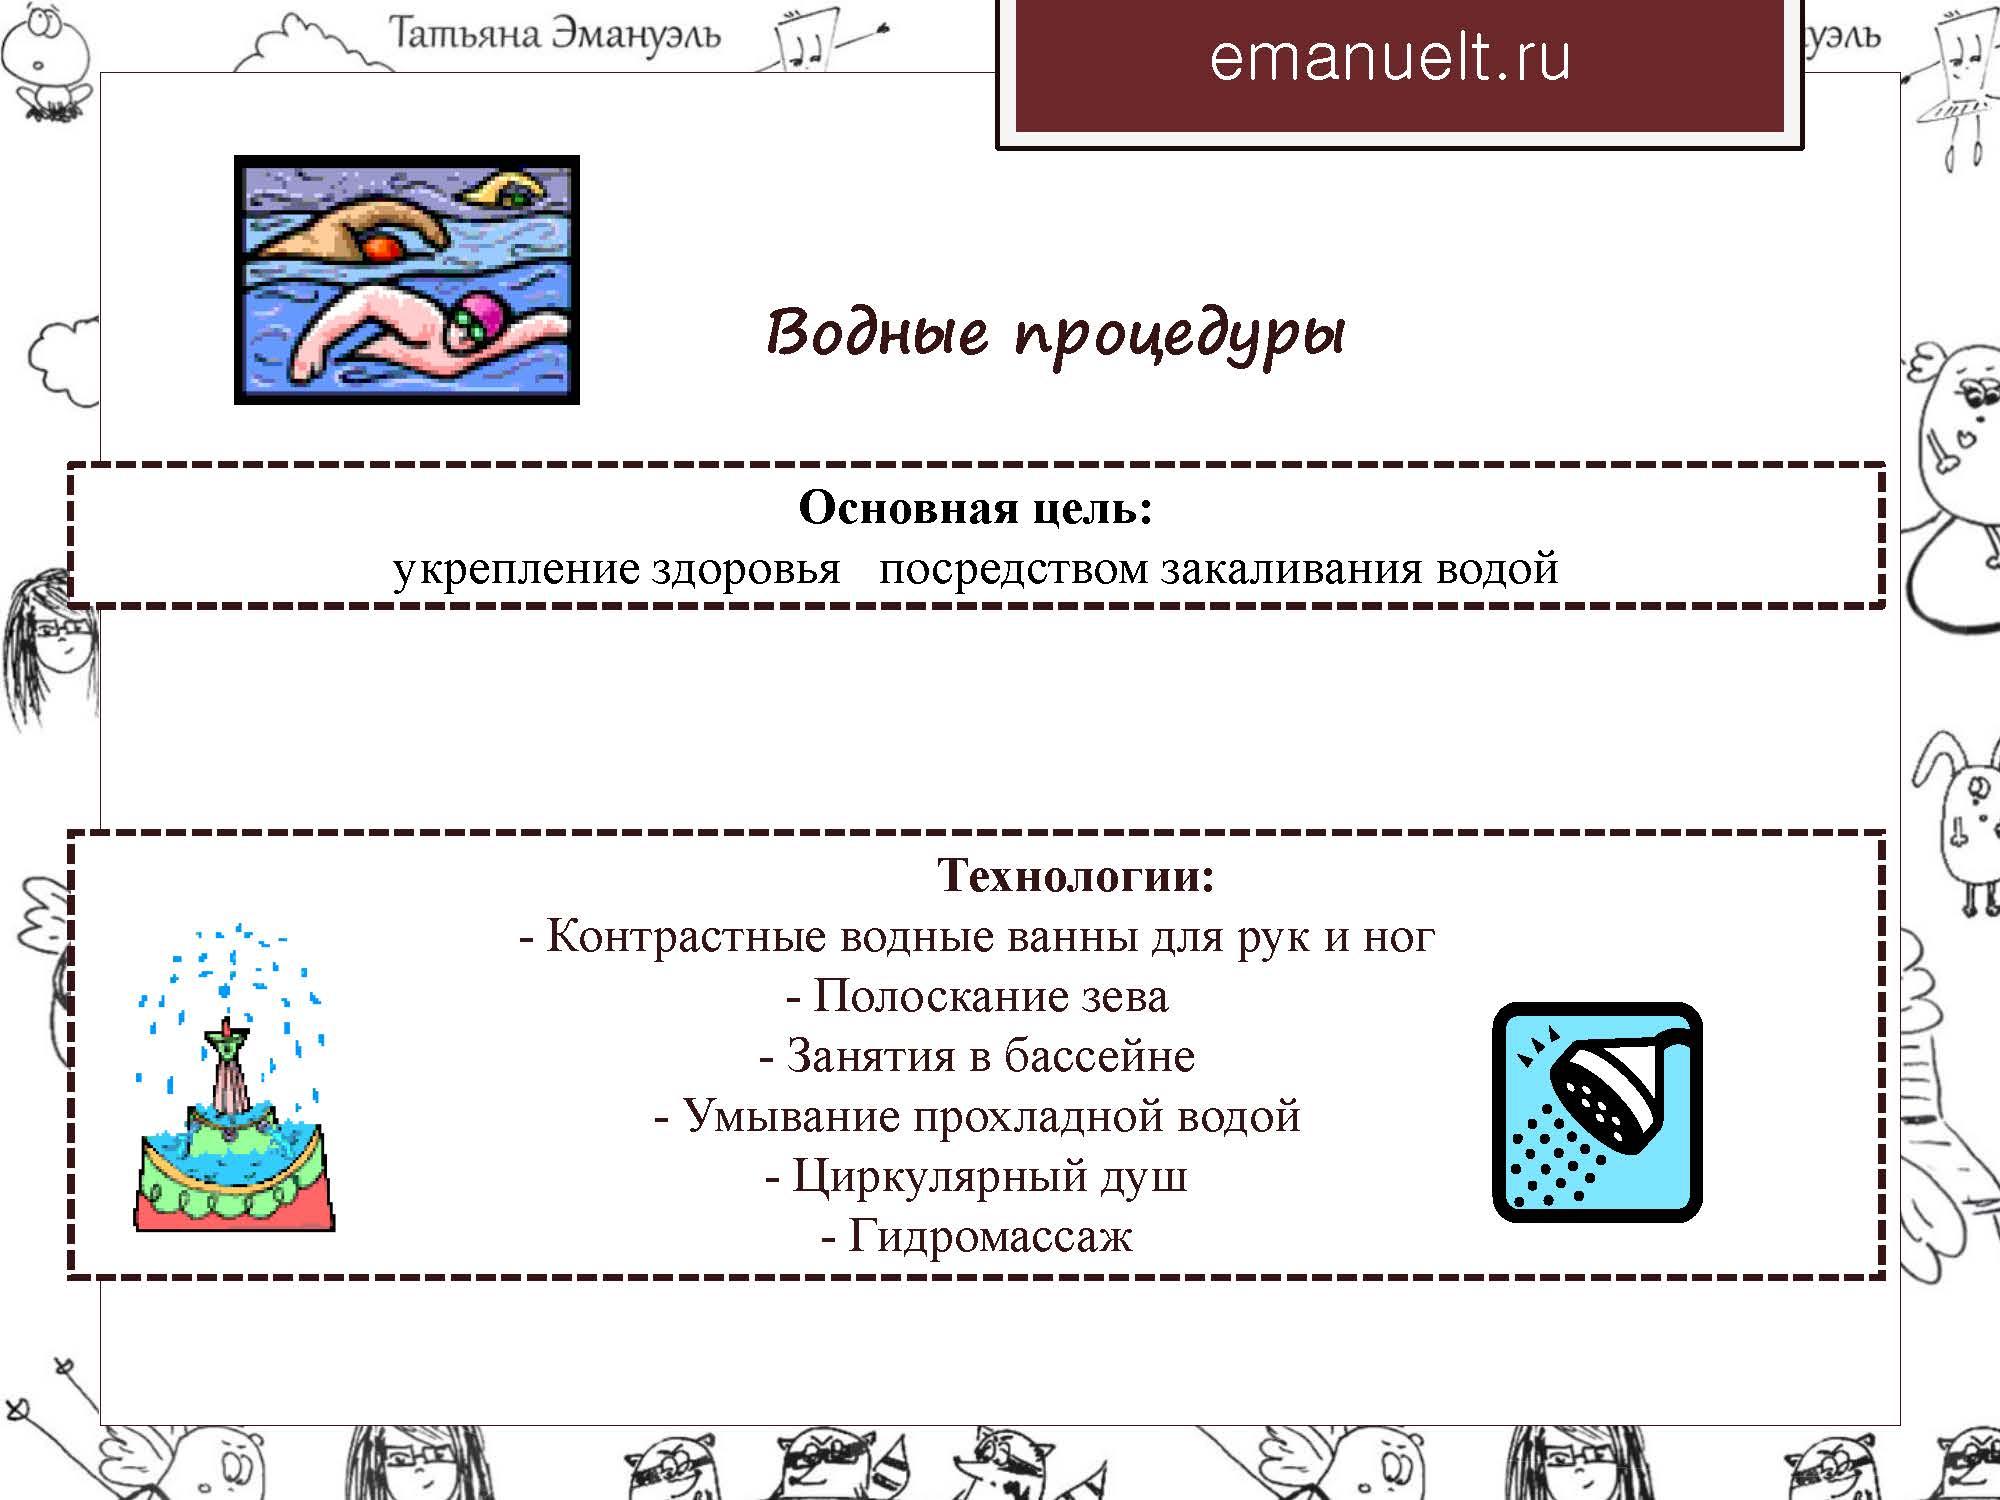 06 февраля эмануэль_Страница_072